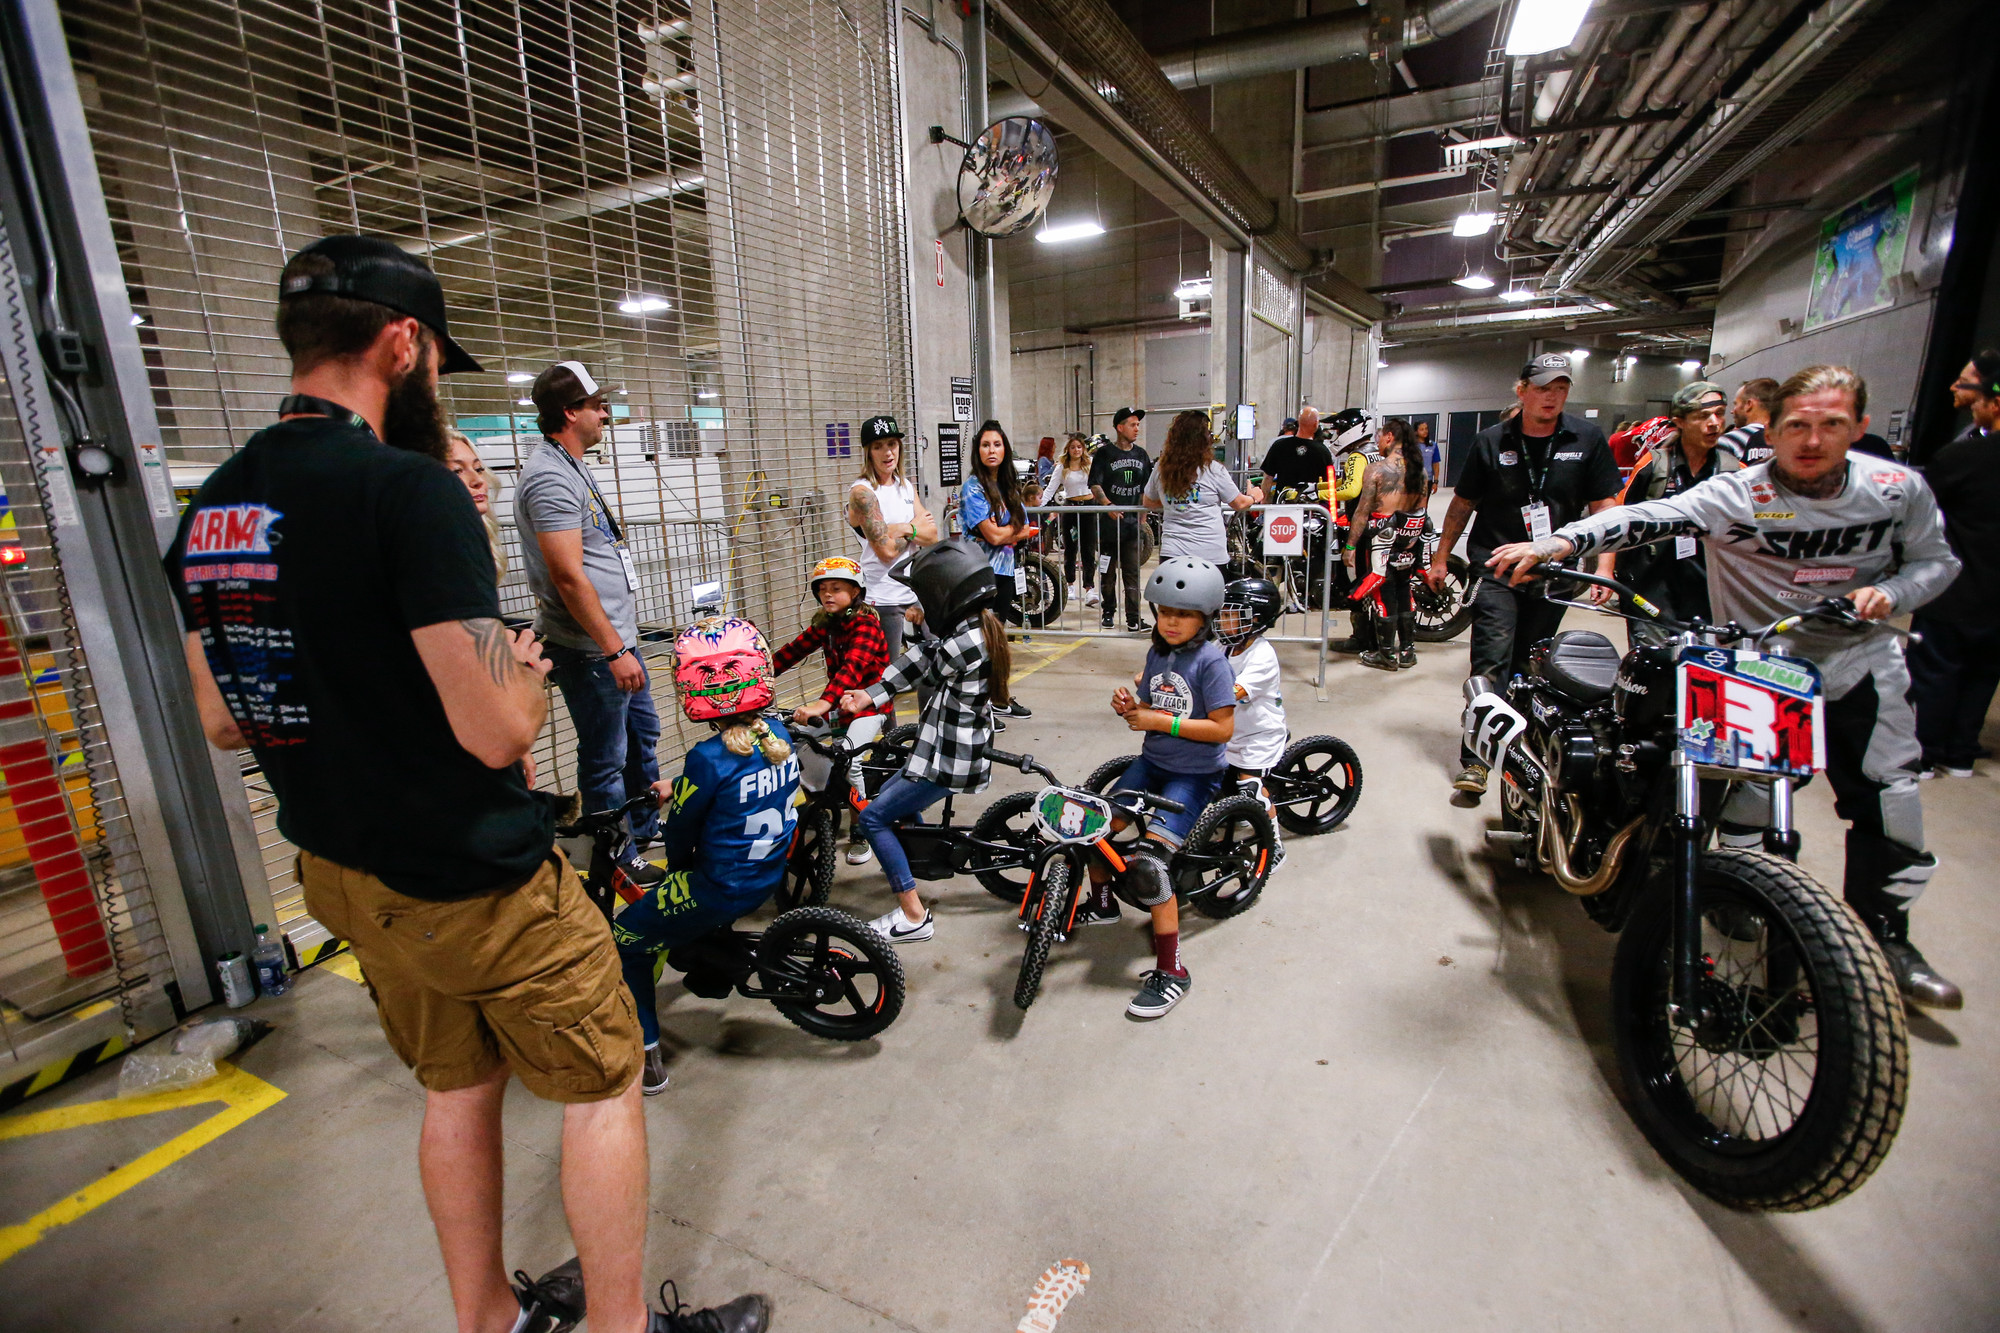 X Games Minneapolis 2019 - August 4, 2019 - Harley-Davidson